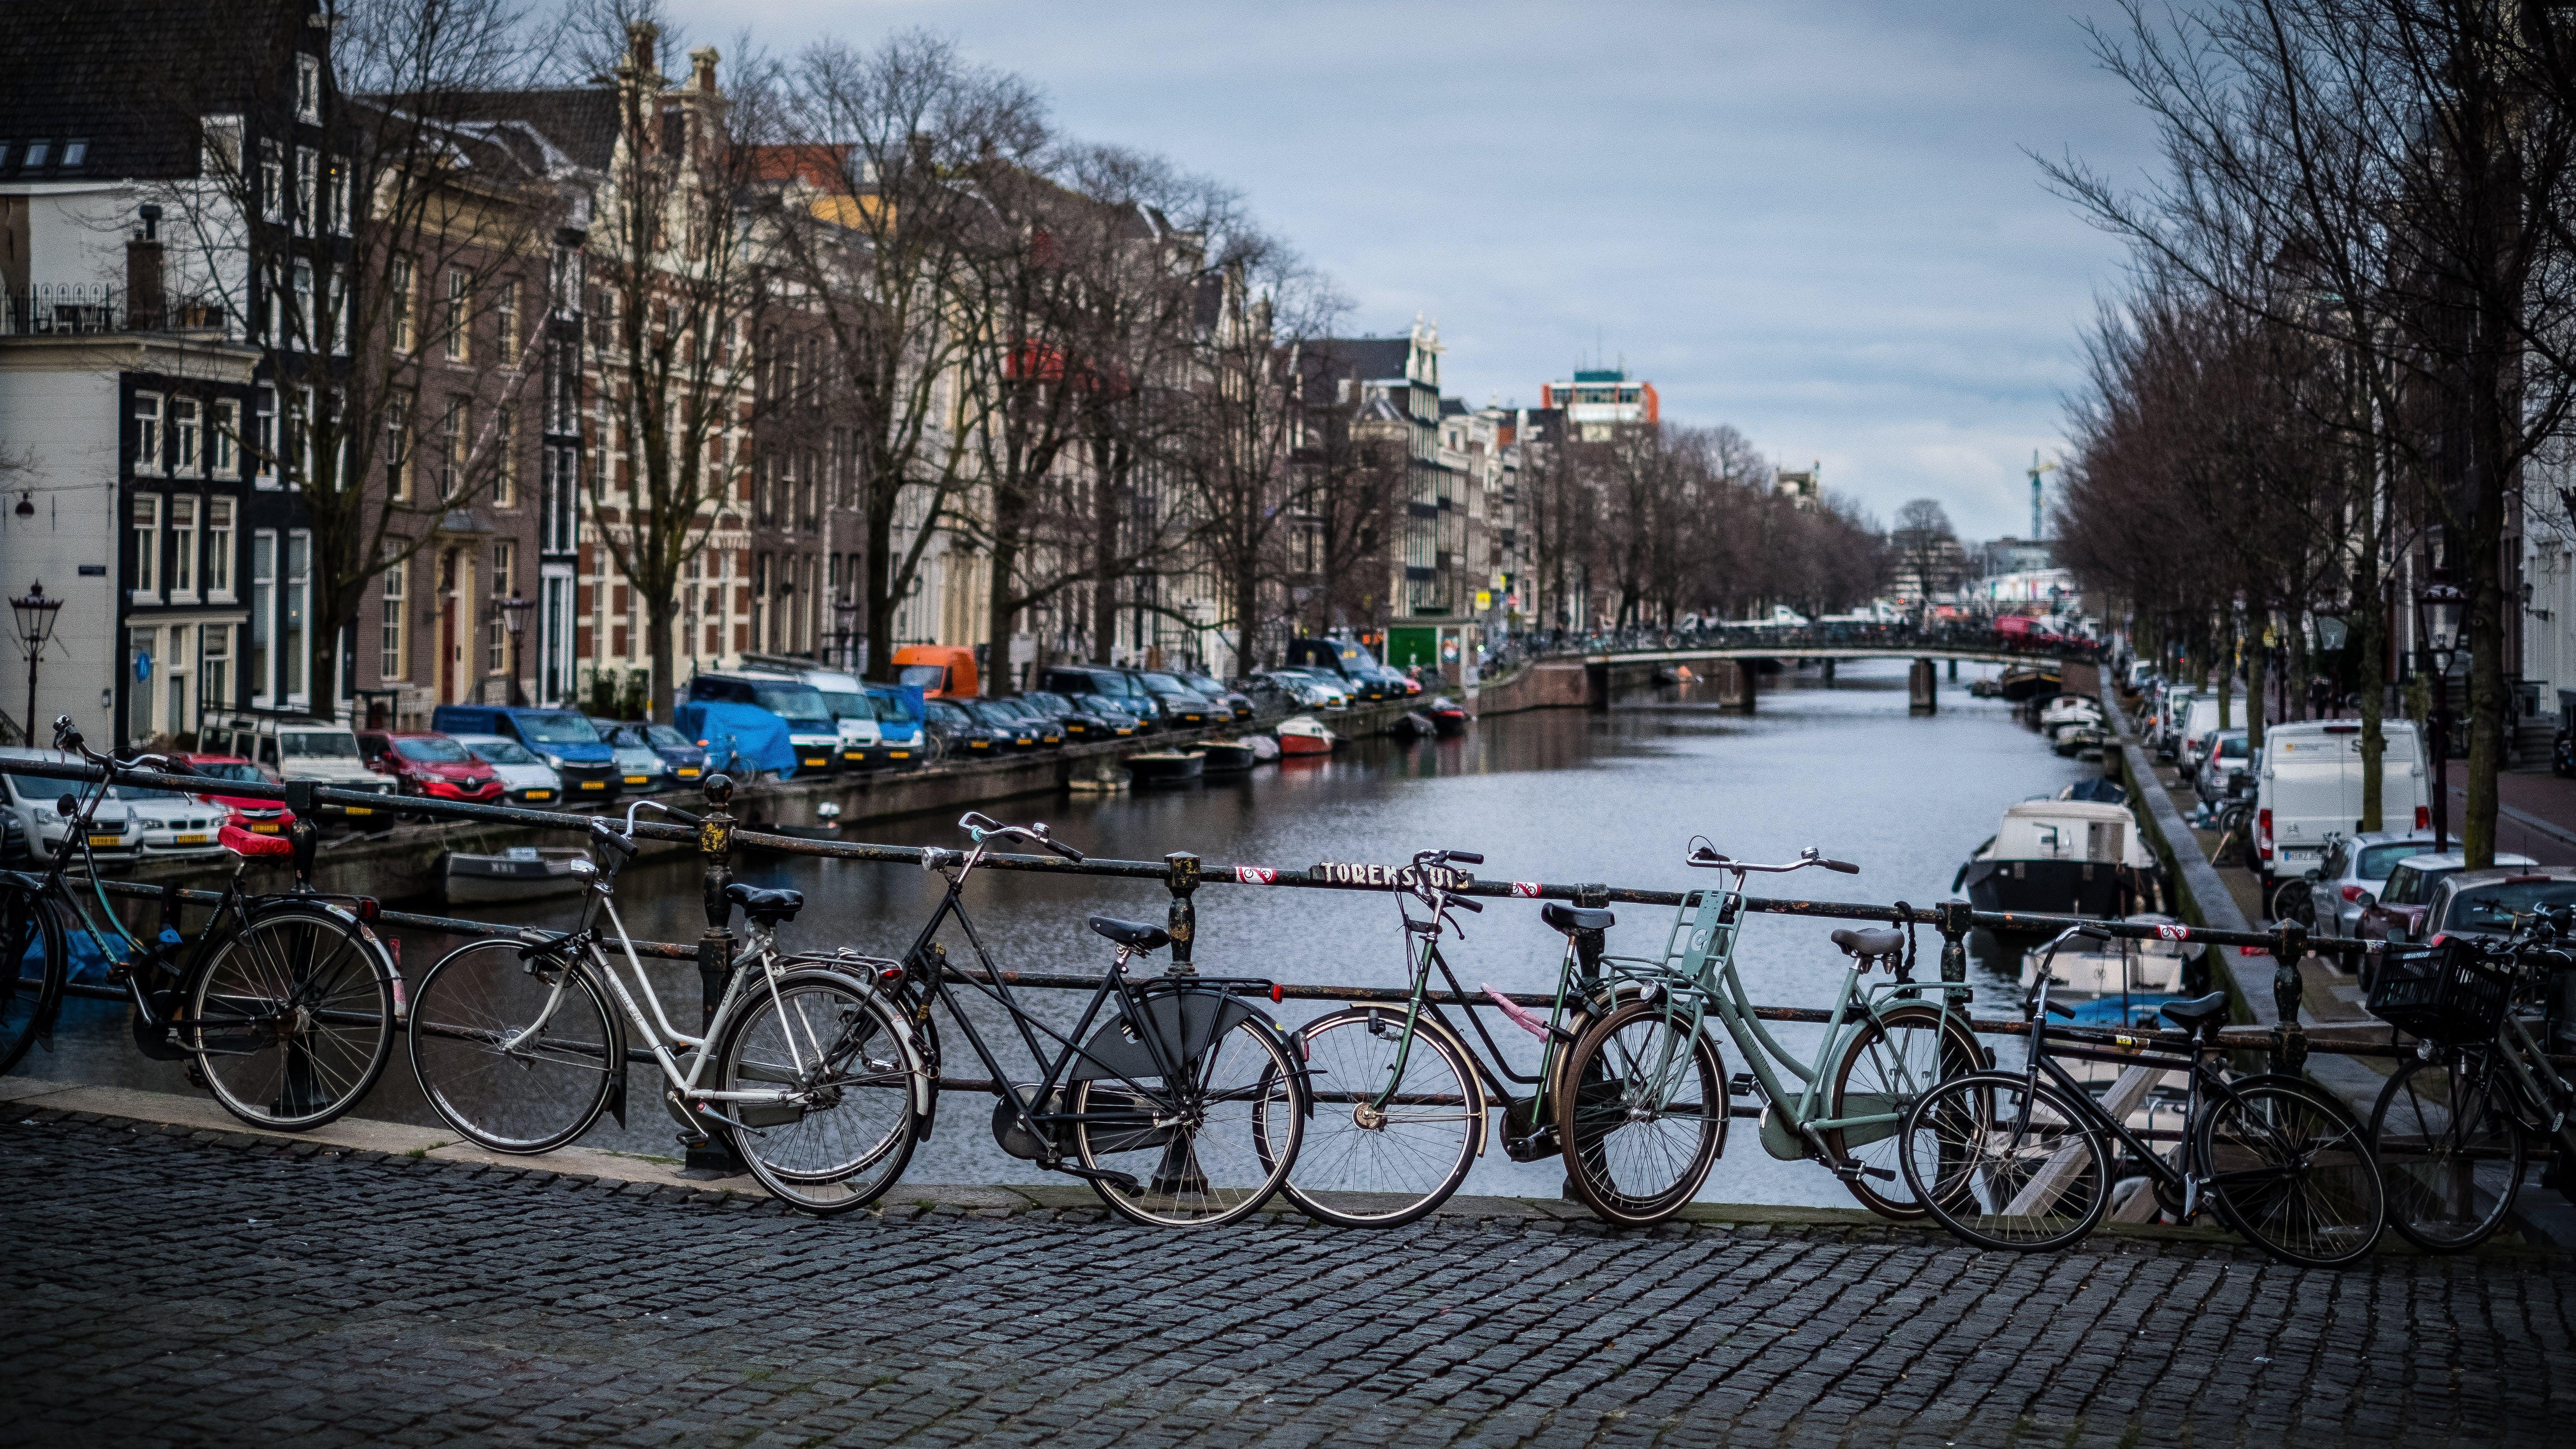 Fotos de stock gratuitas de 35 mm, amsterdam, bicicletas, calle